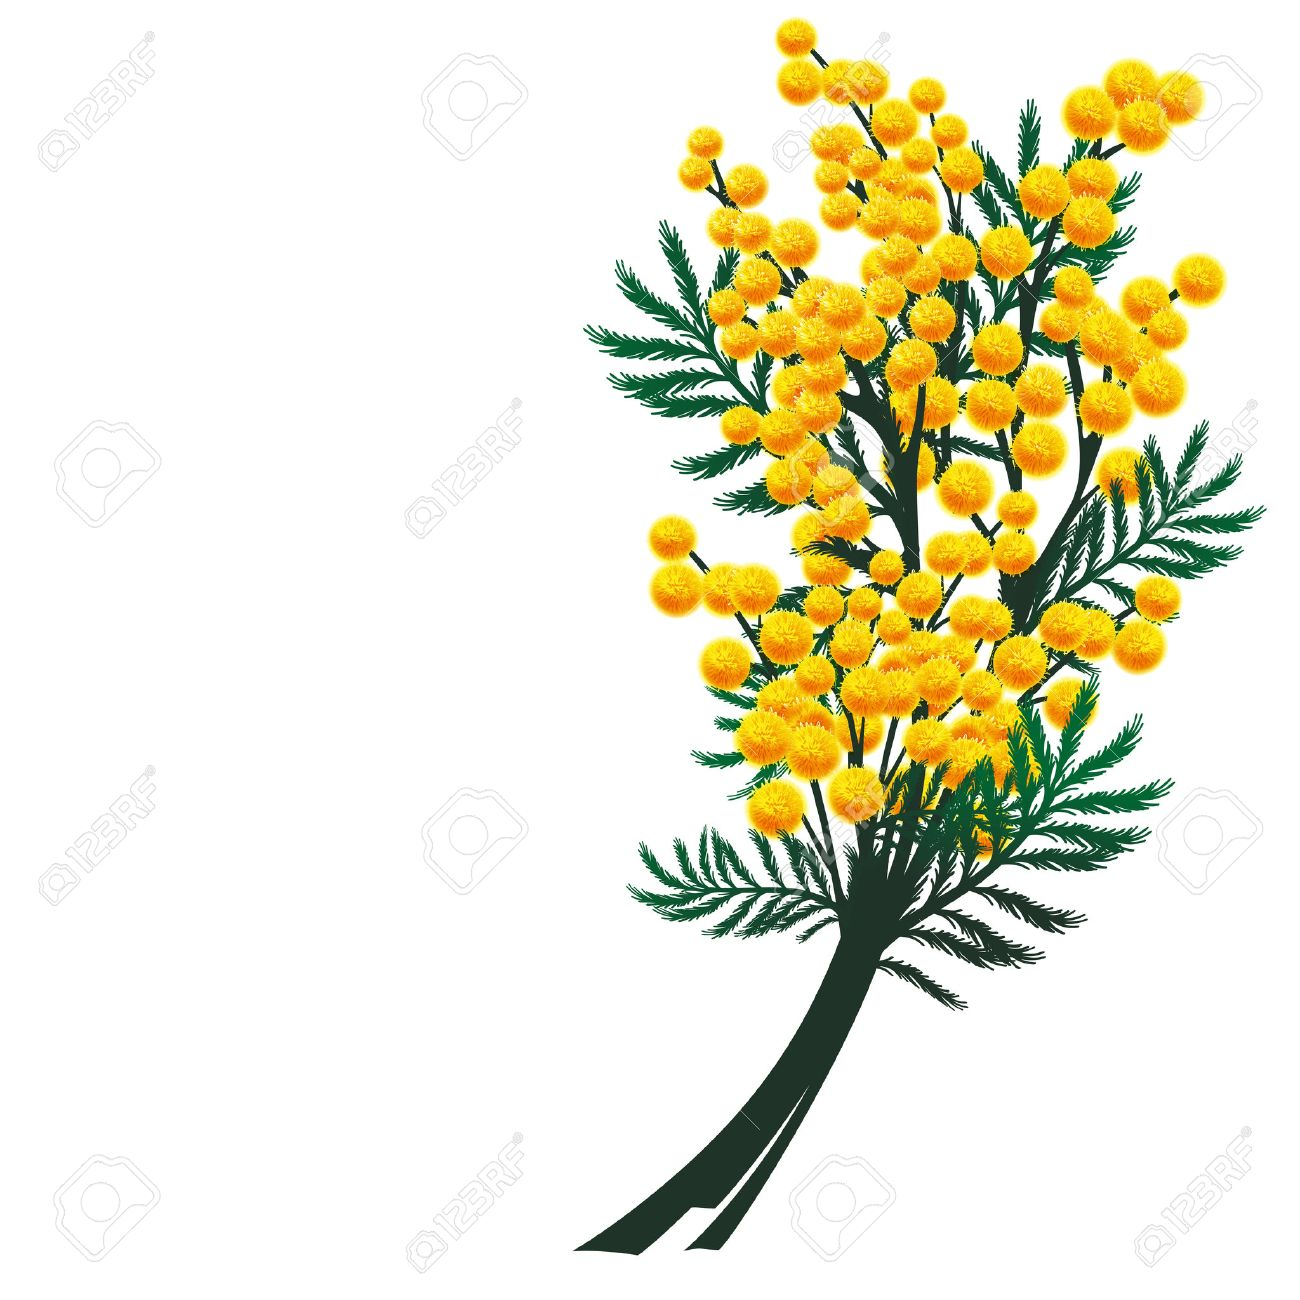 Mimosa flowers - 25042079